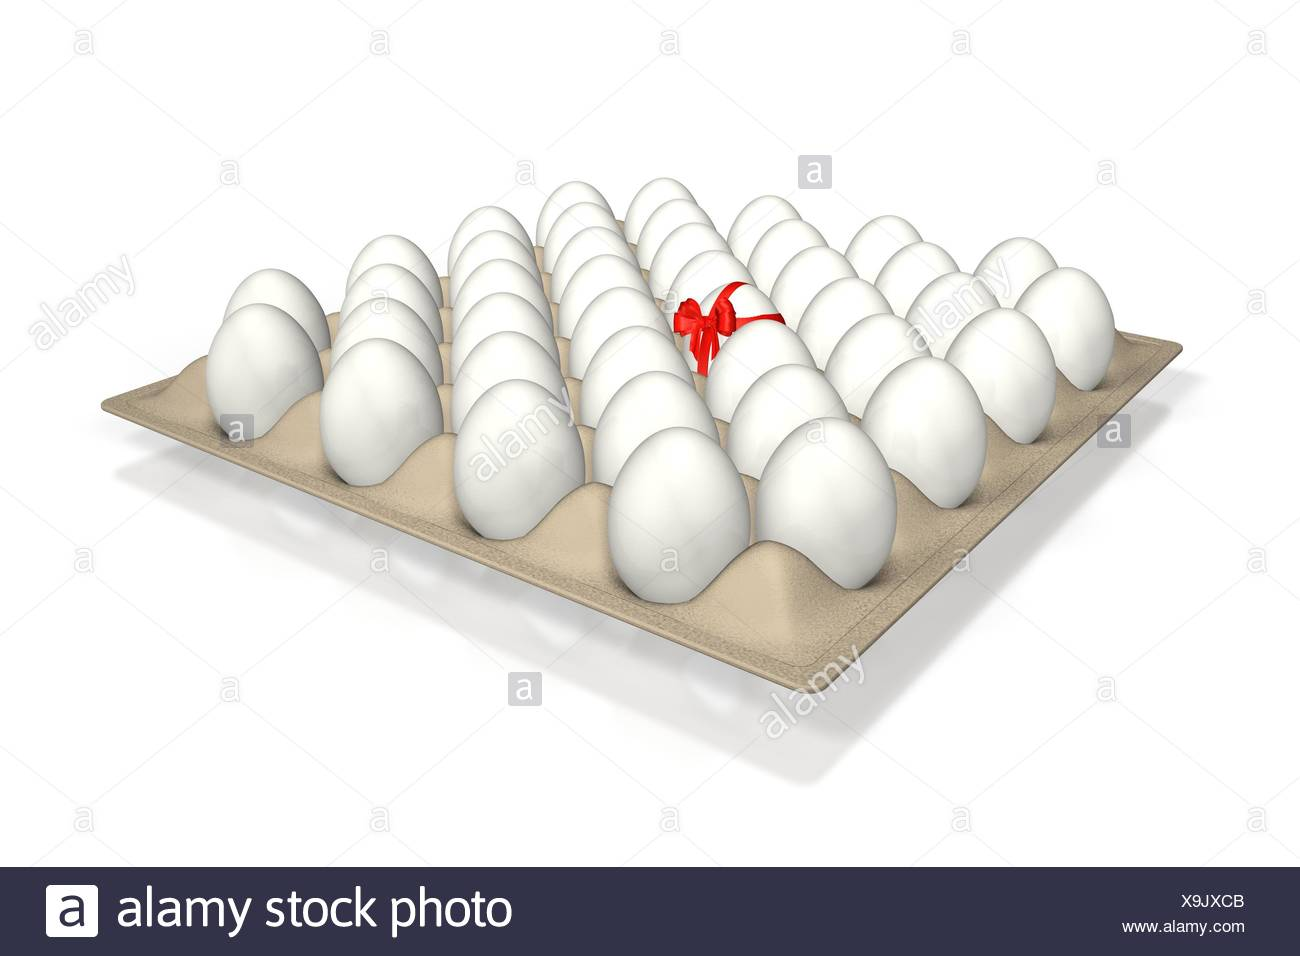 model design project concept plan draft transport loop eggs backdrop background - Stock Image